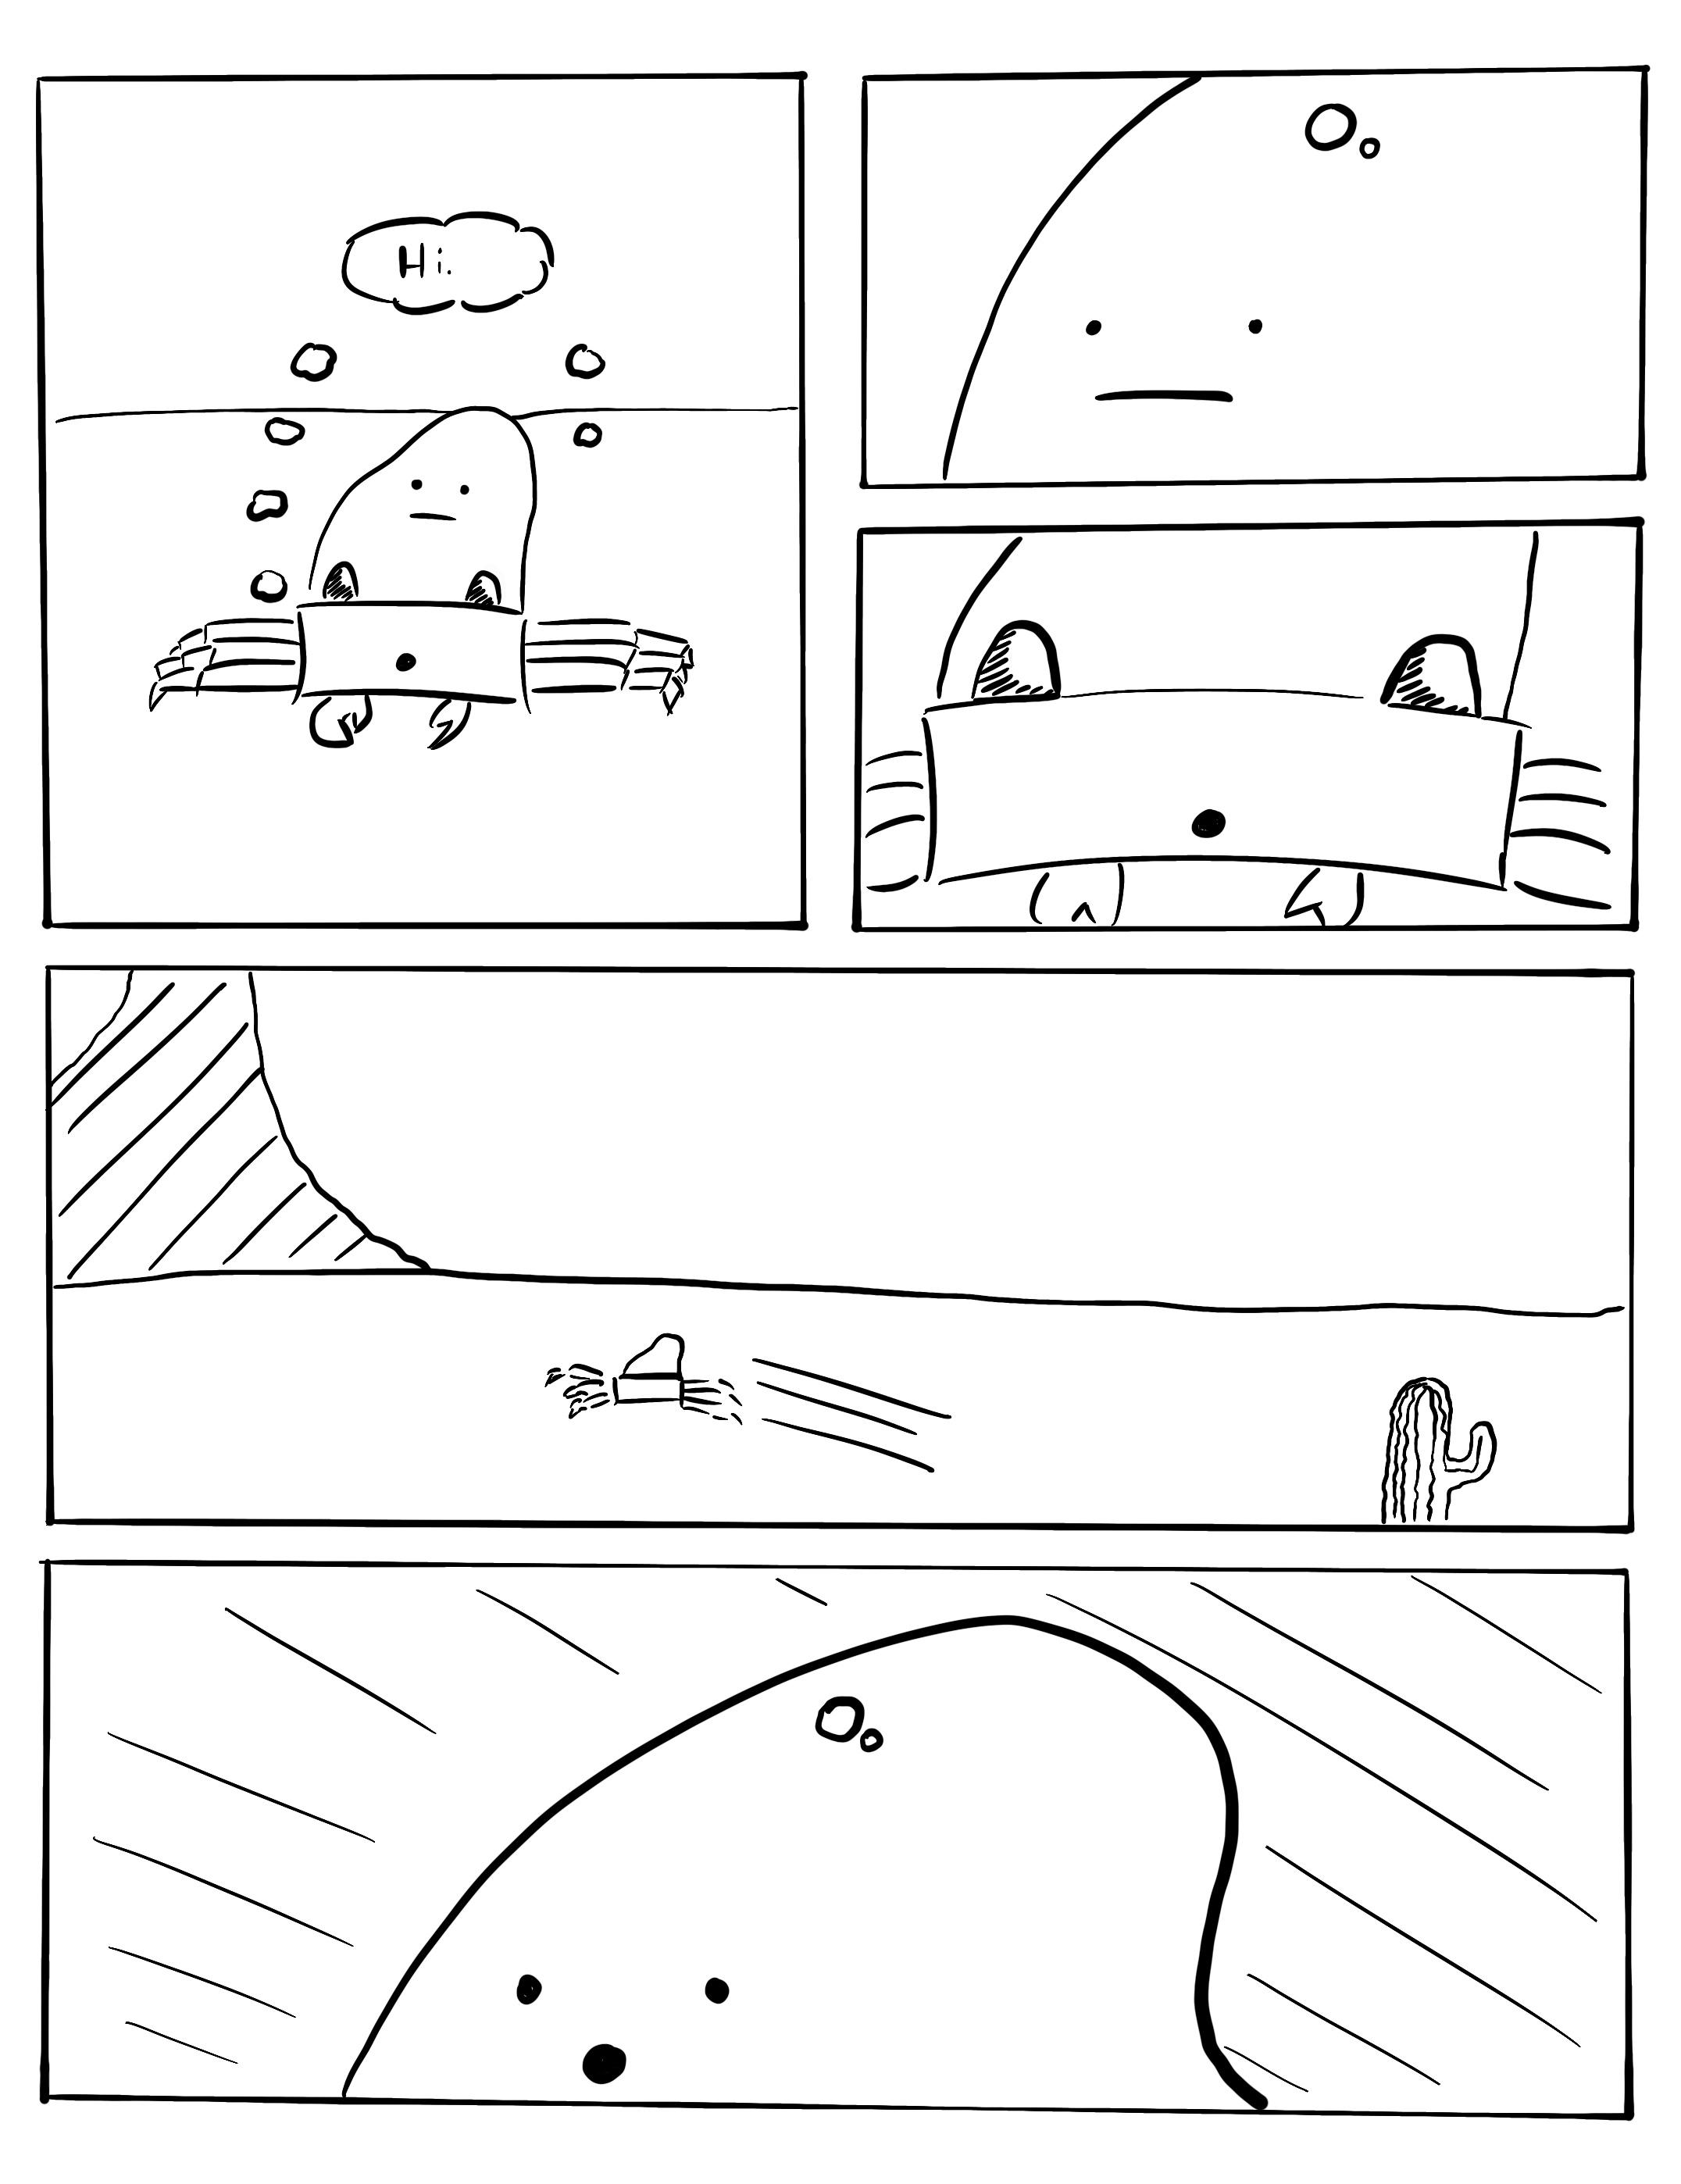 Comic_Digital_4.JPG